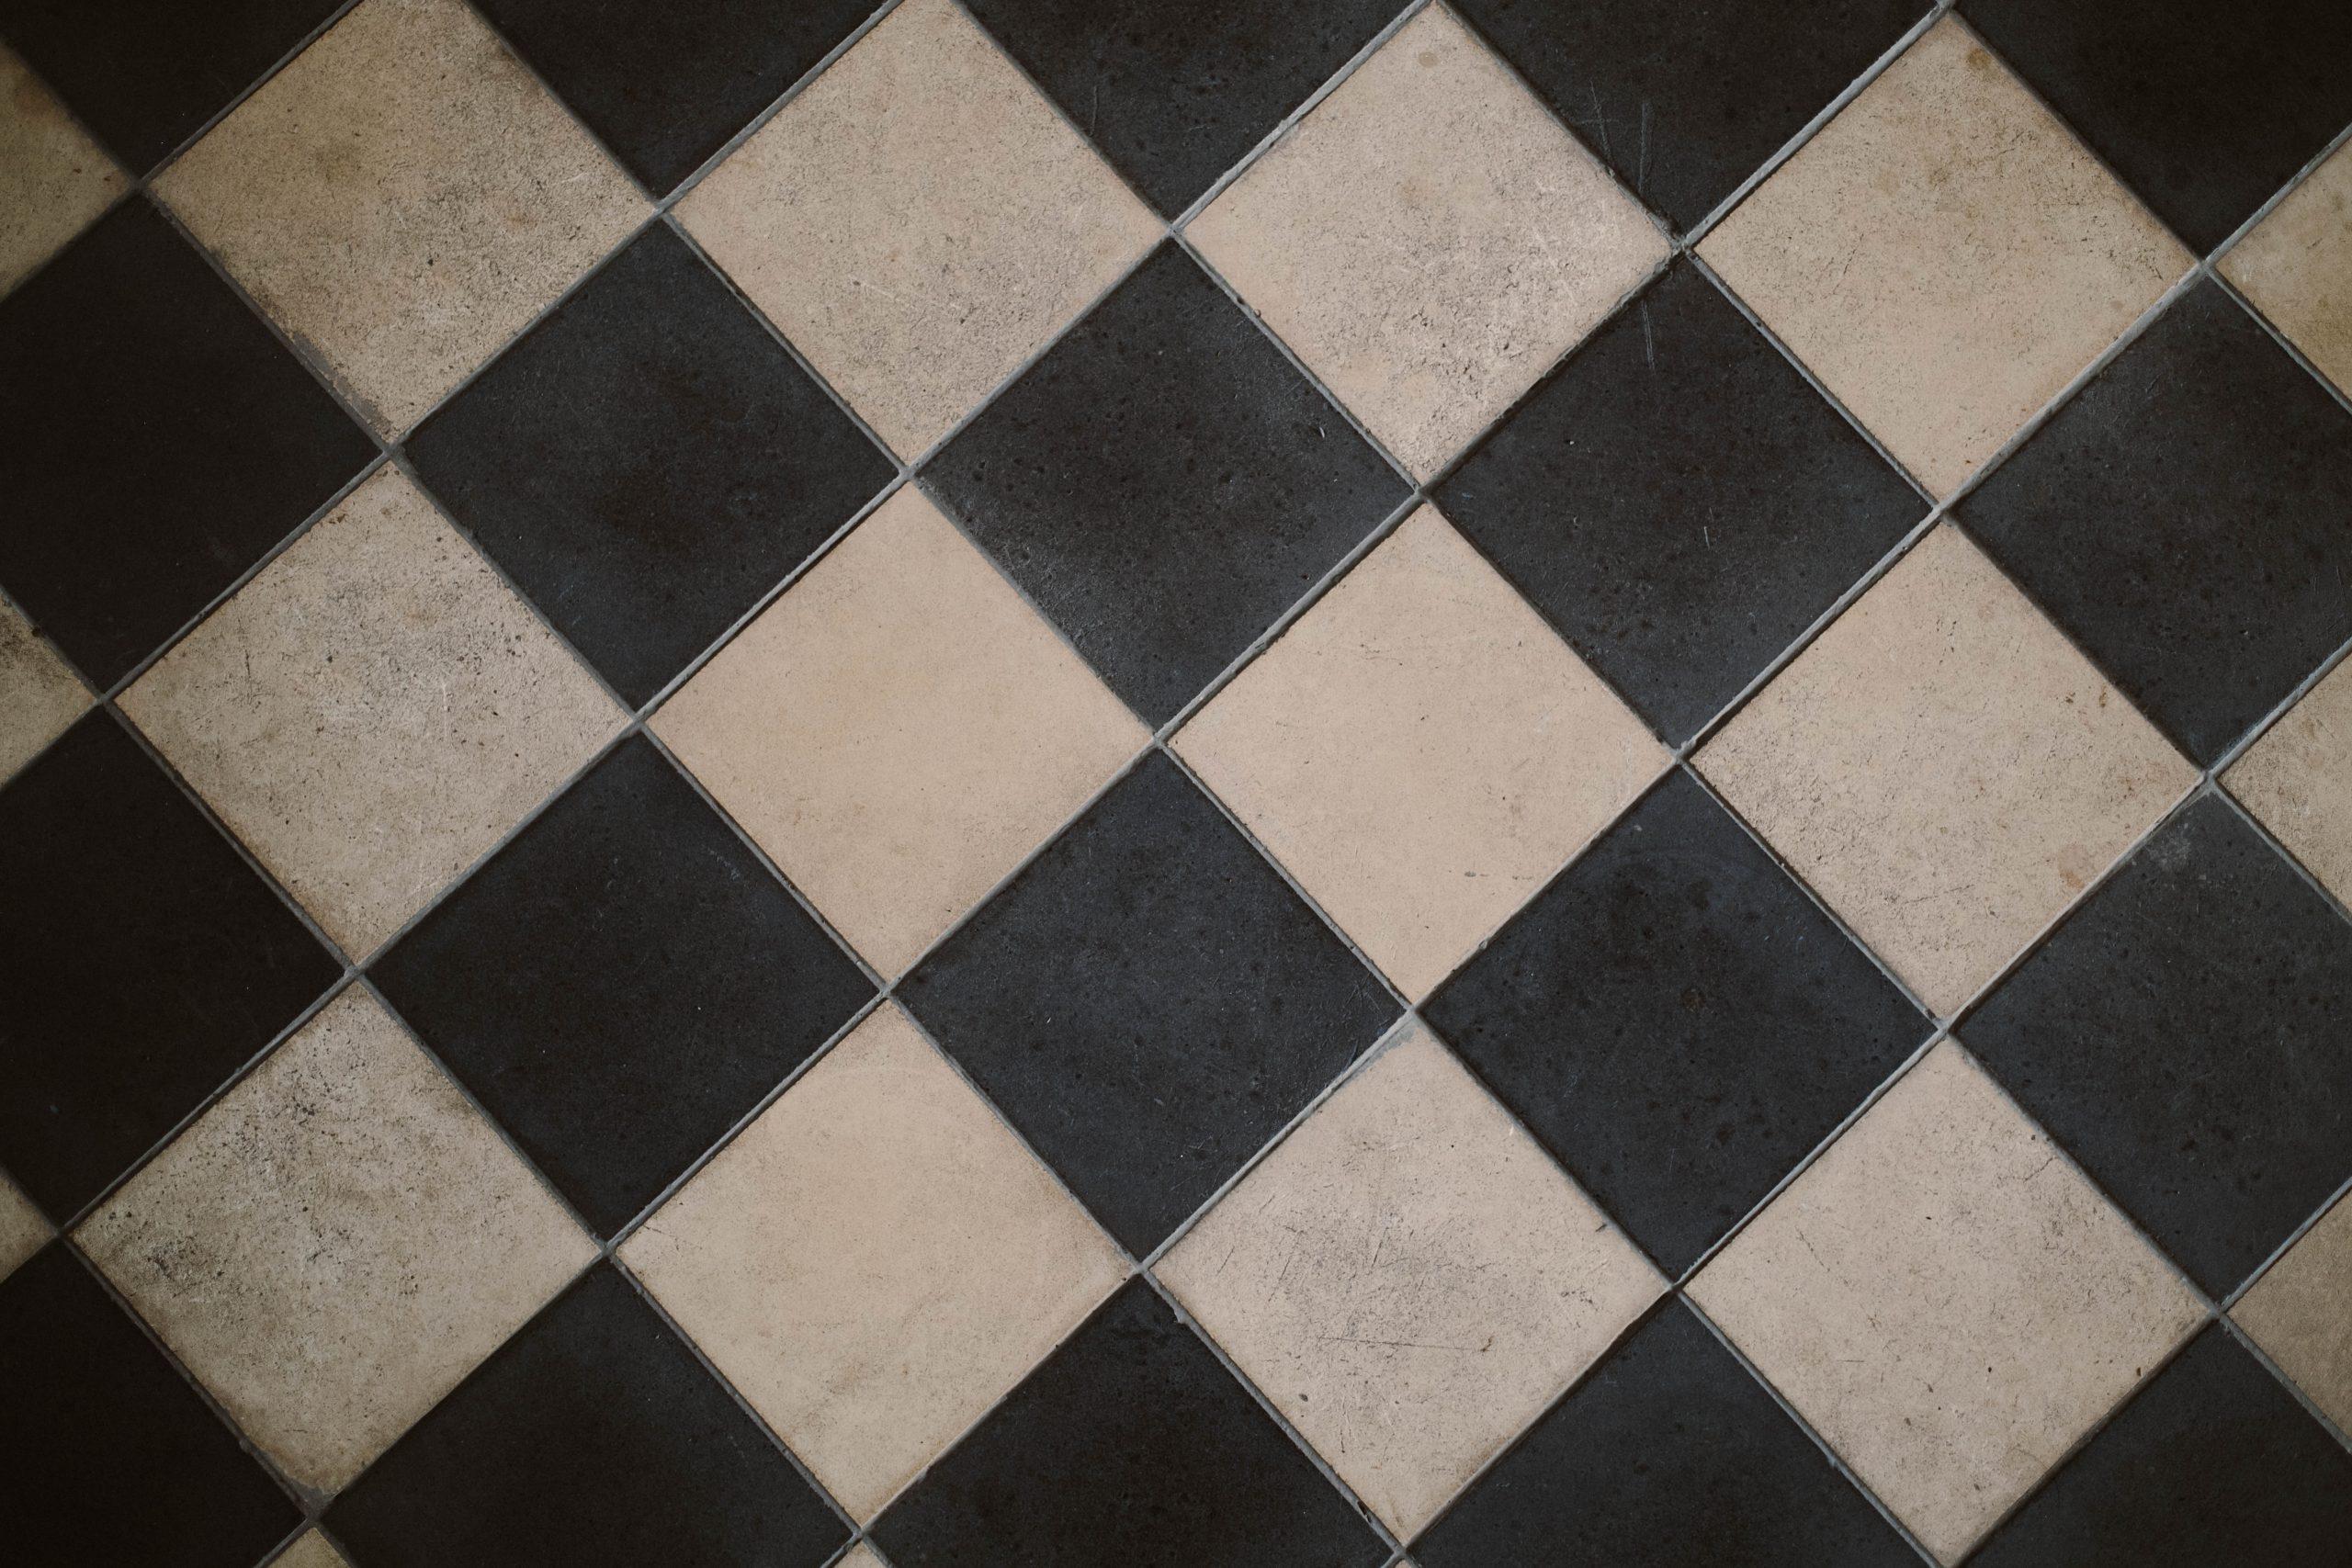 Damaged Floor Tiles